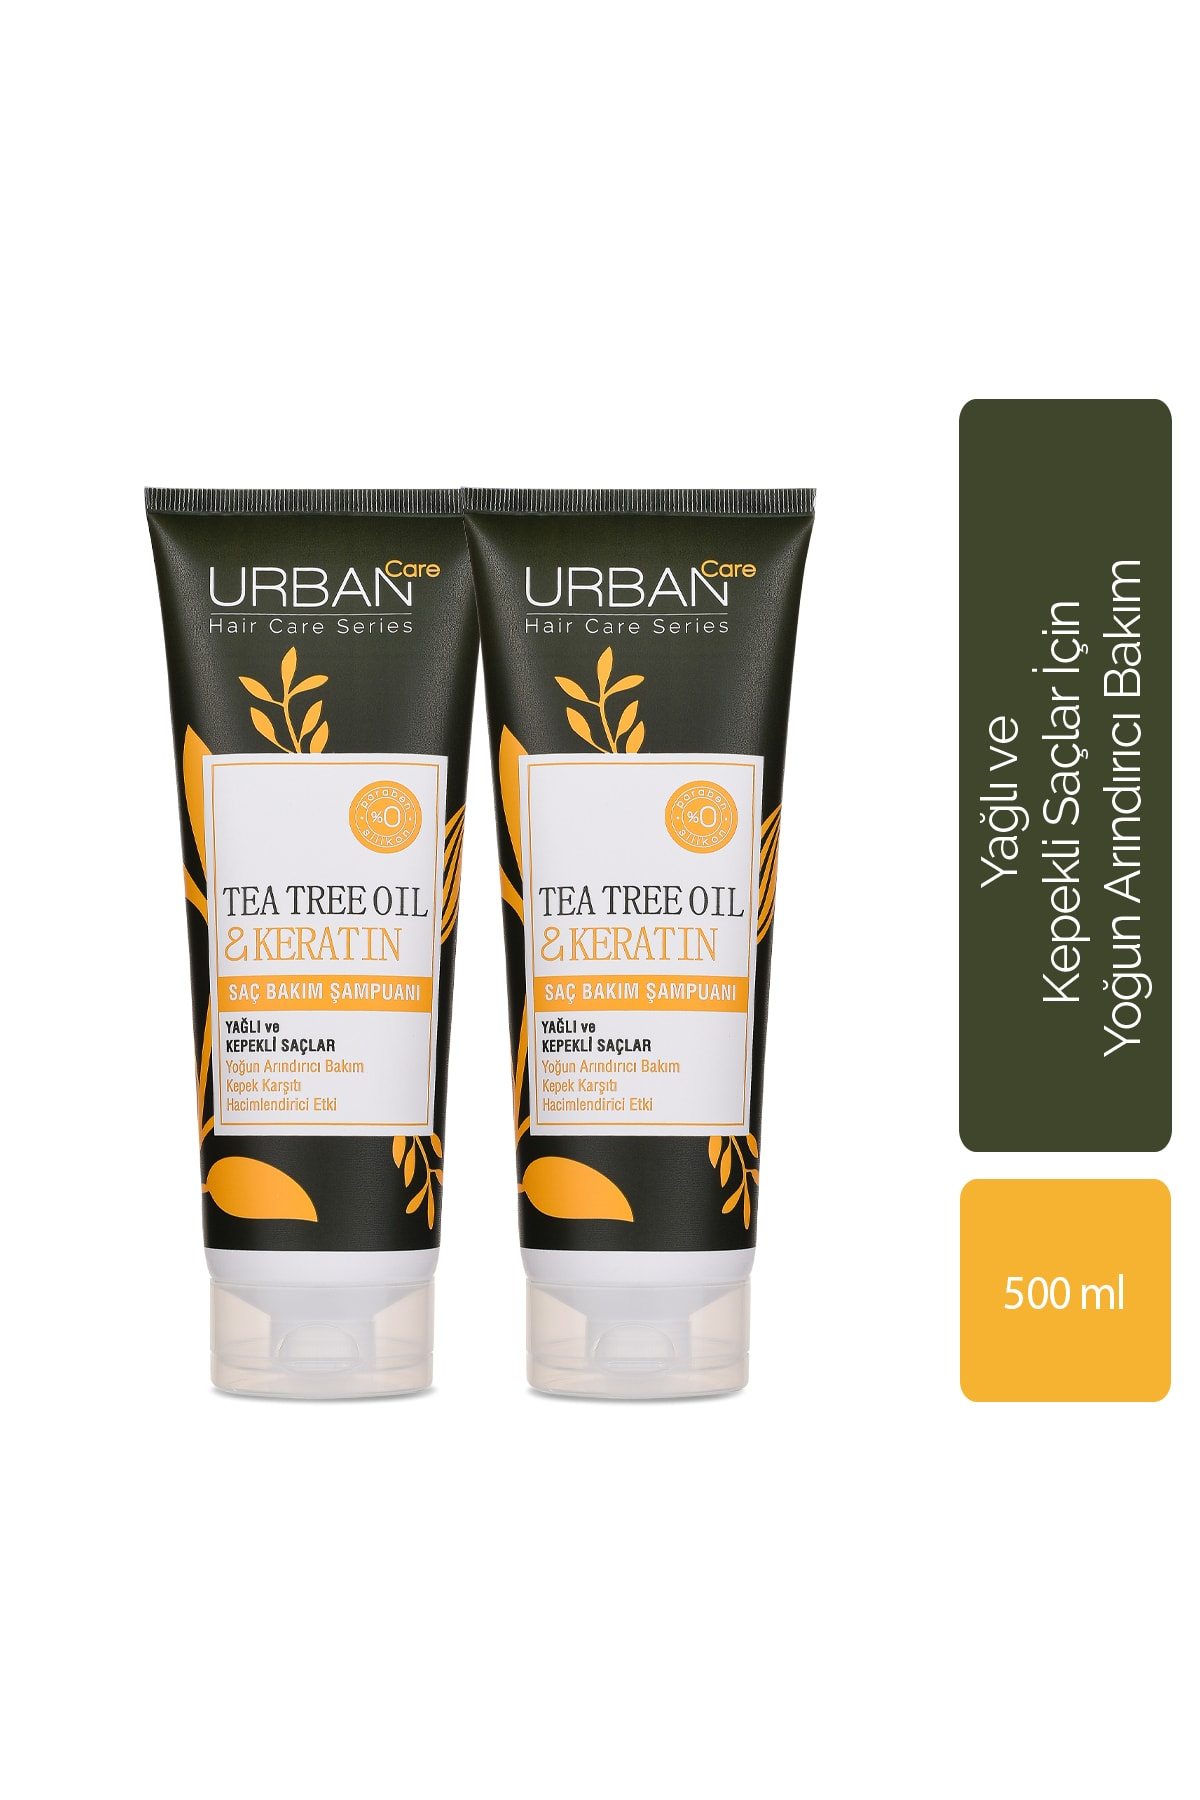 Urban Care Tea Tree Oil & Keratin Saç Bakım Şampuanı x2'li Set